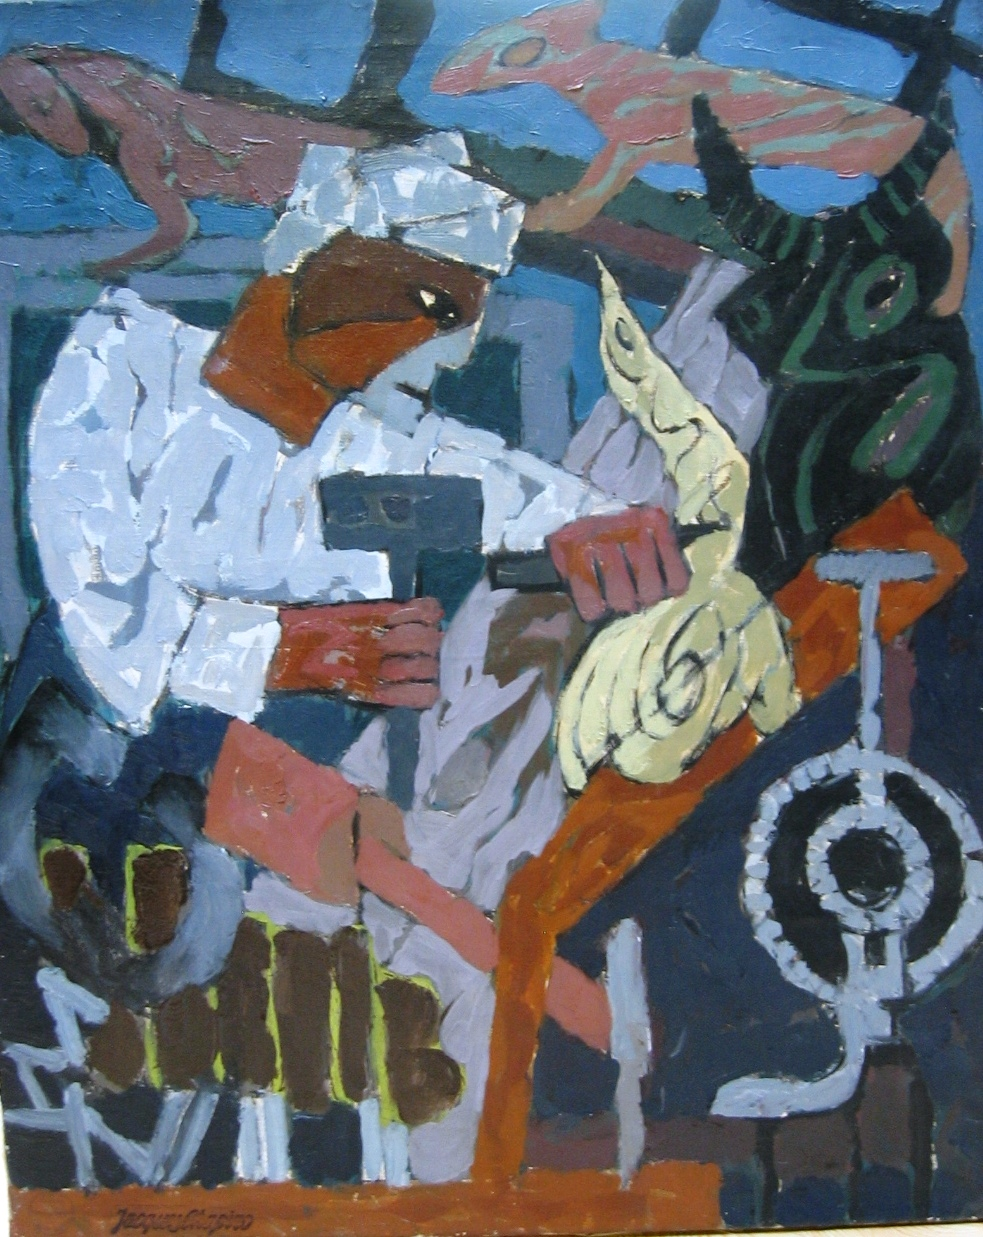 Sculptor. Oil on canvas. Size: 73 cm x 59.5 cm.